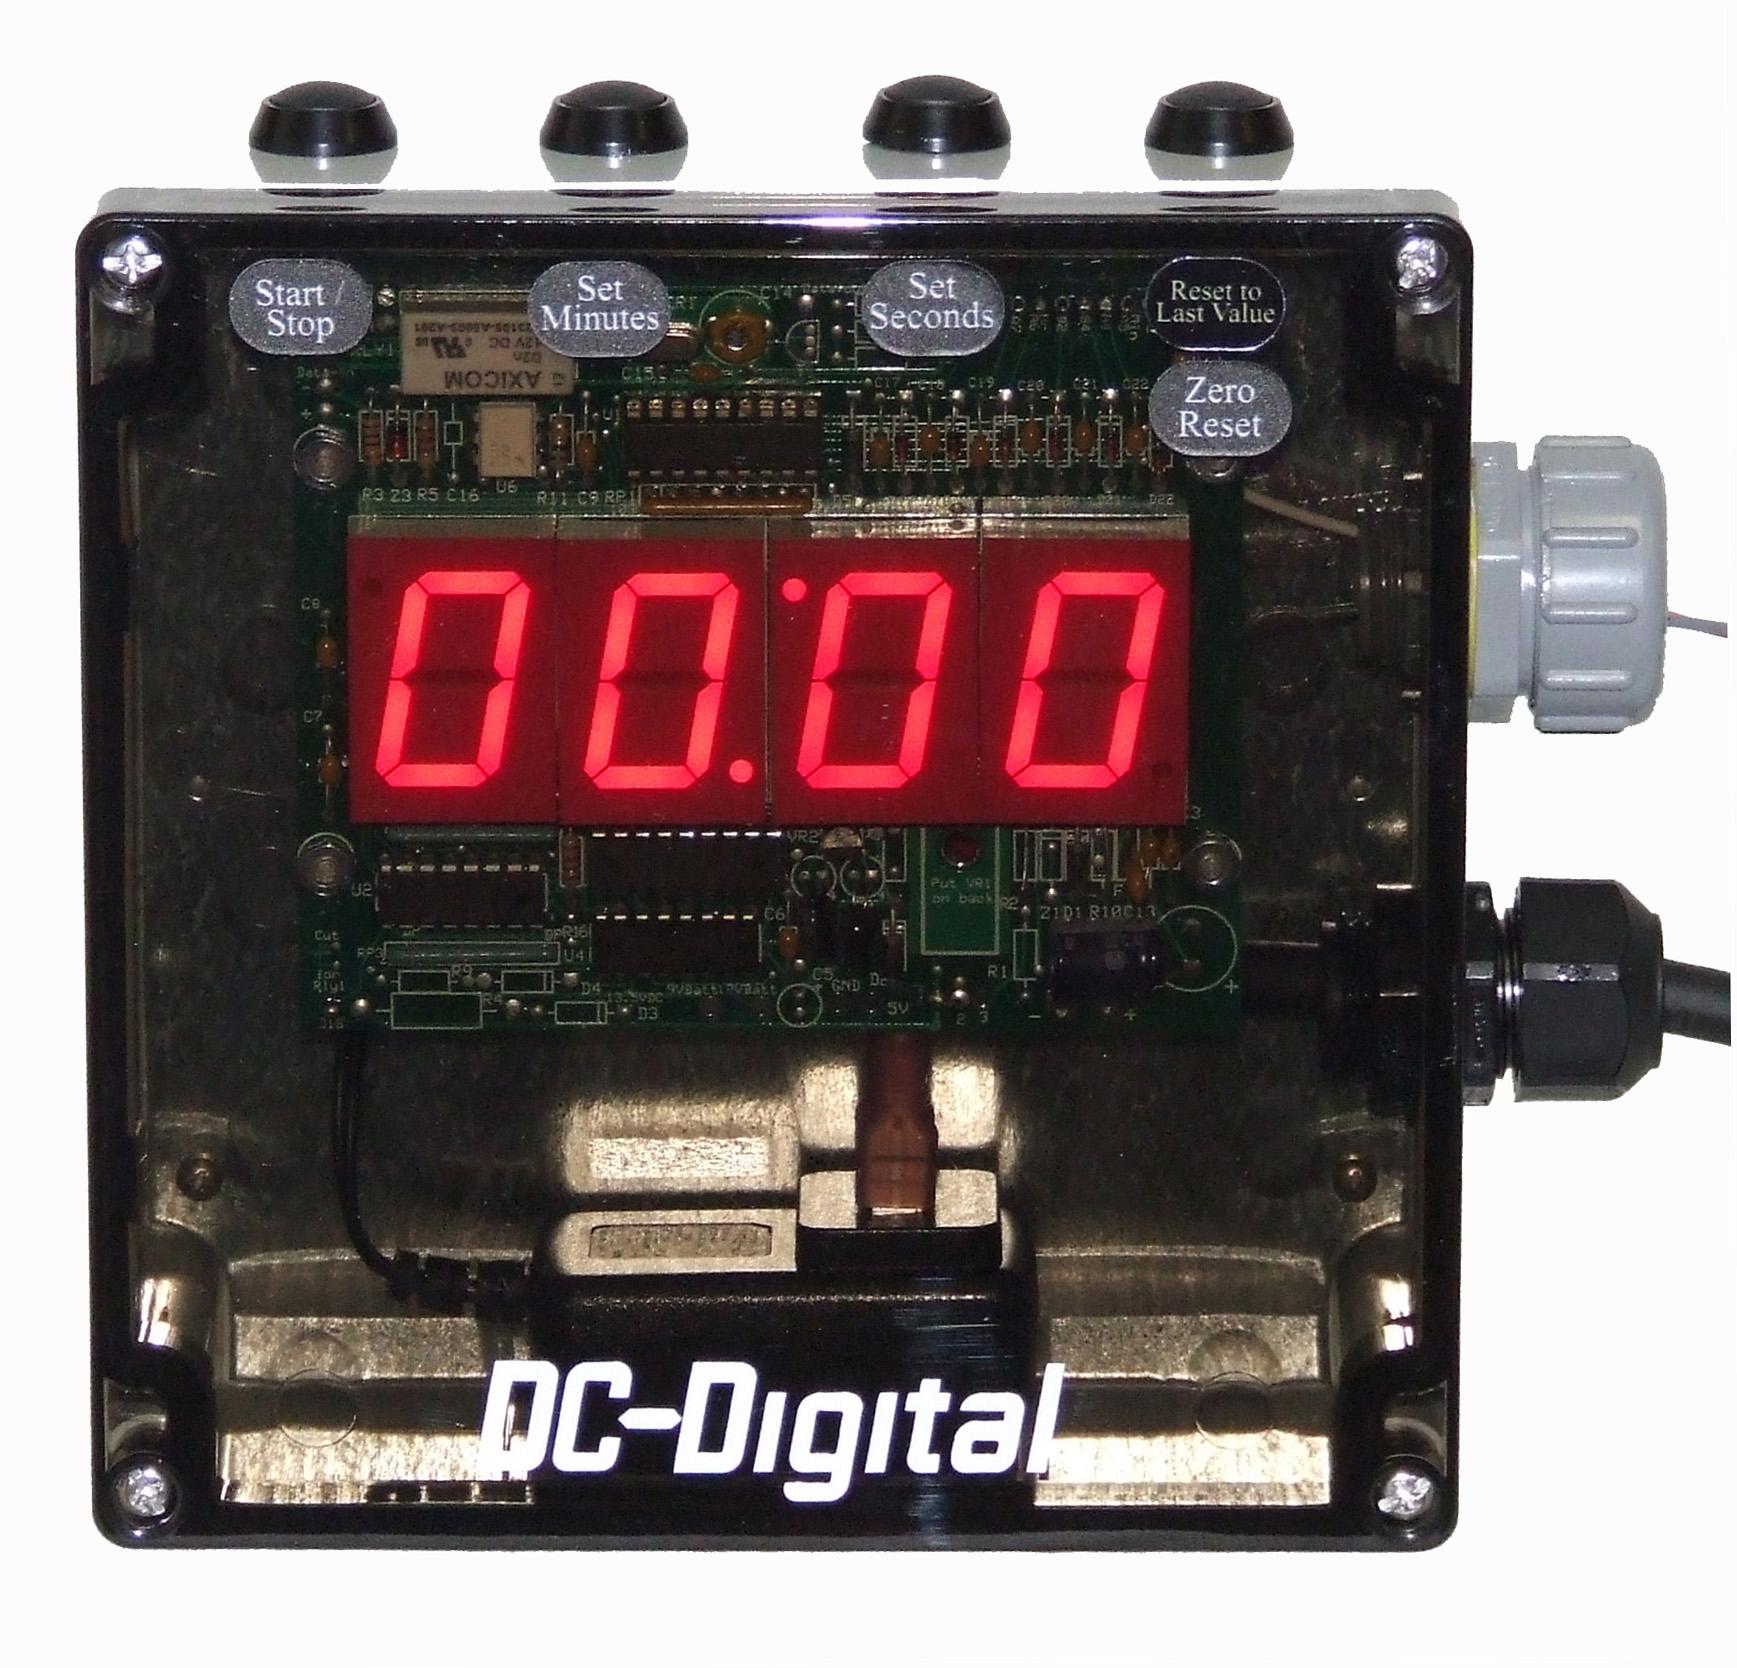 DC-10T-DN 4 digit countdown timer with nema 4x enclosure